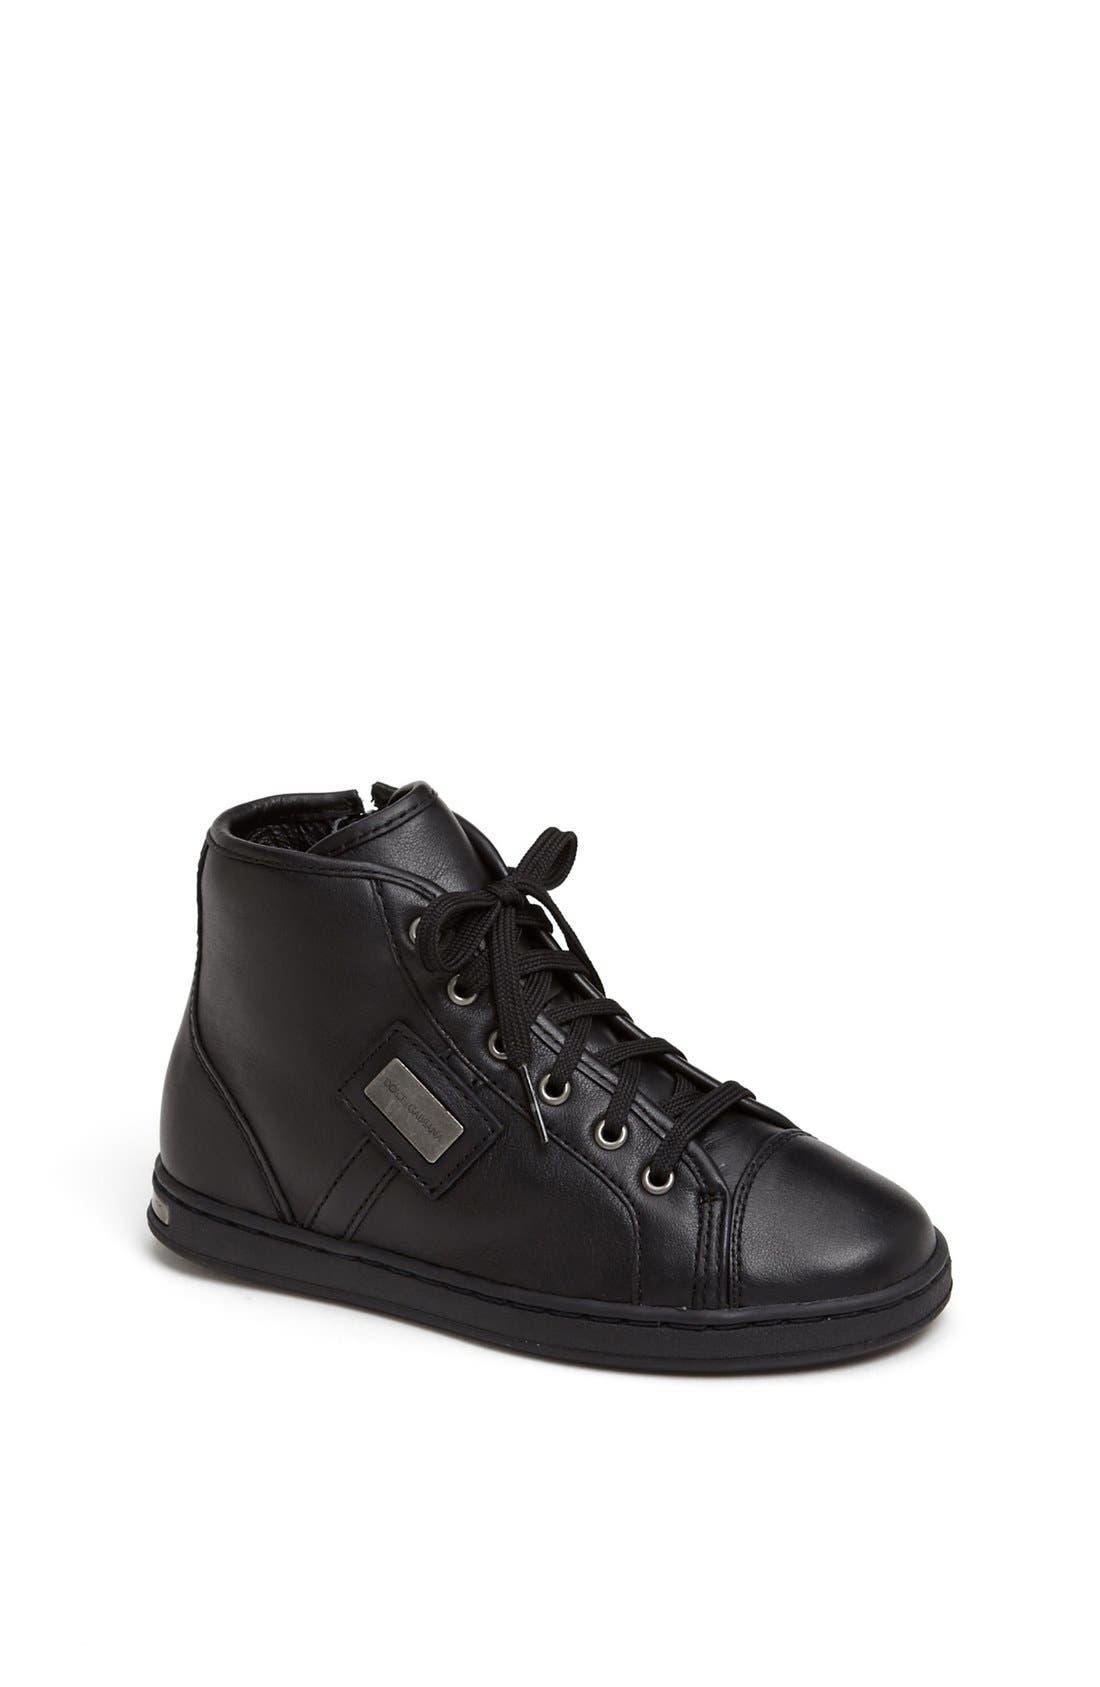 Alternate Image 1 Selected - Dolce&Gabbana High Top Sneaker (Toddler & Little Kid)